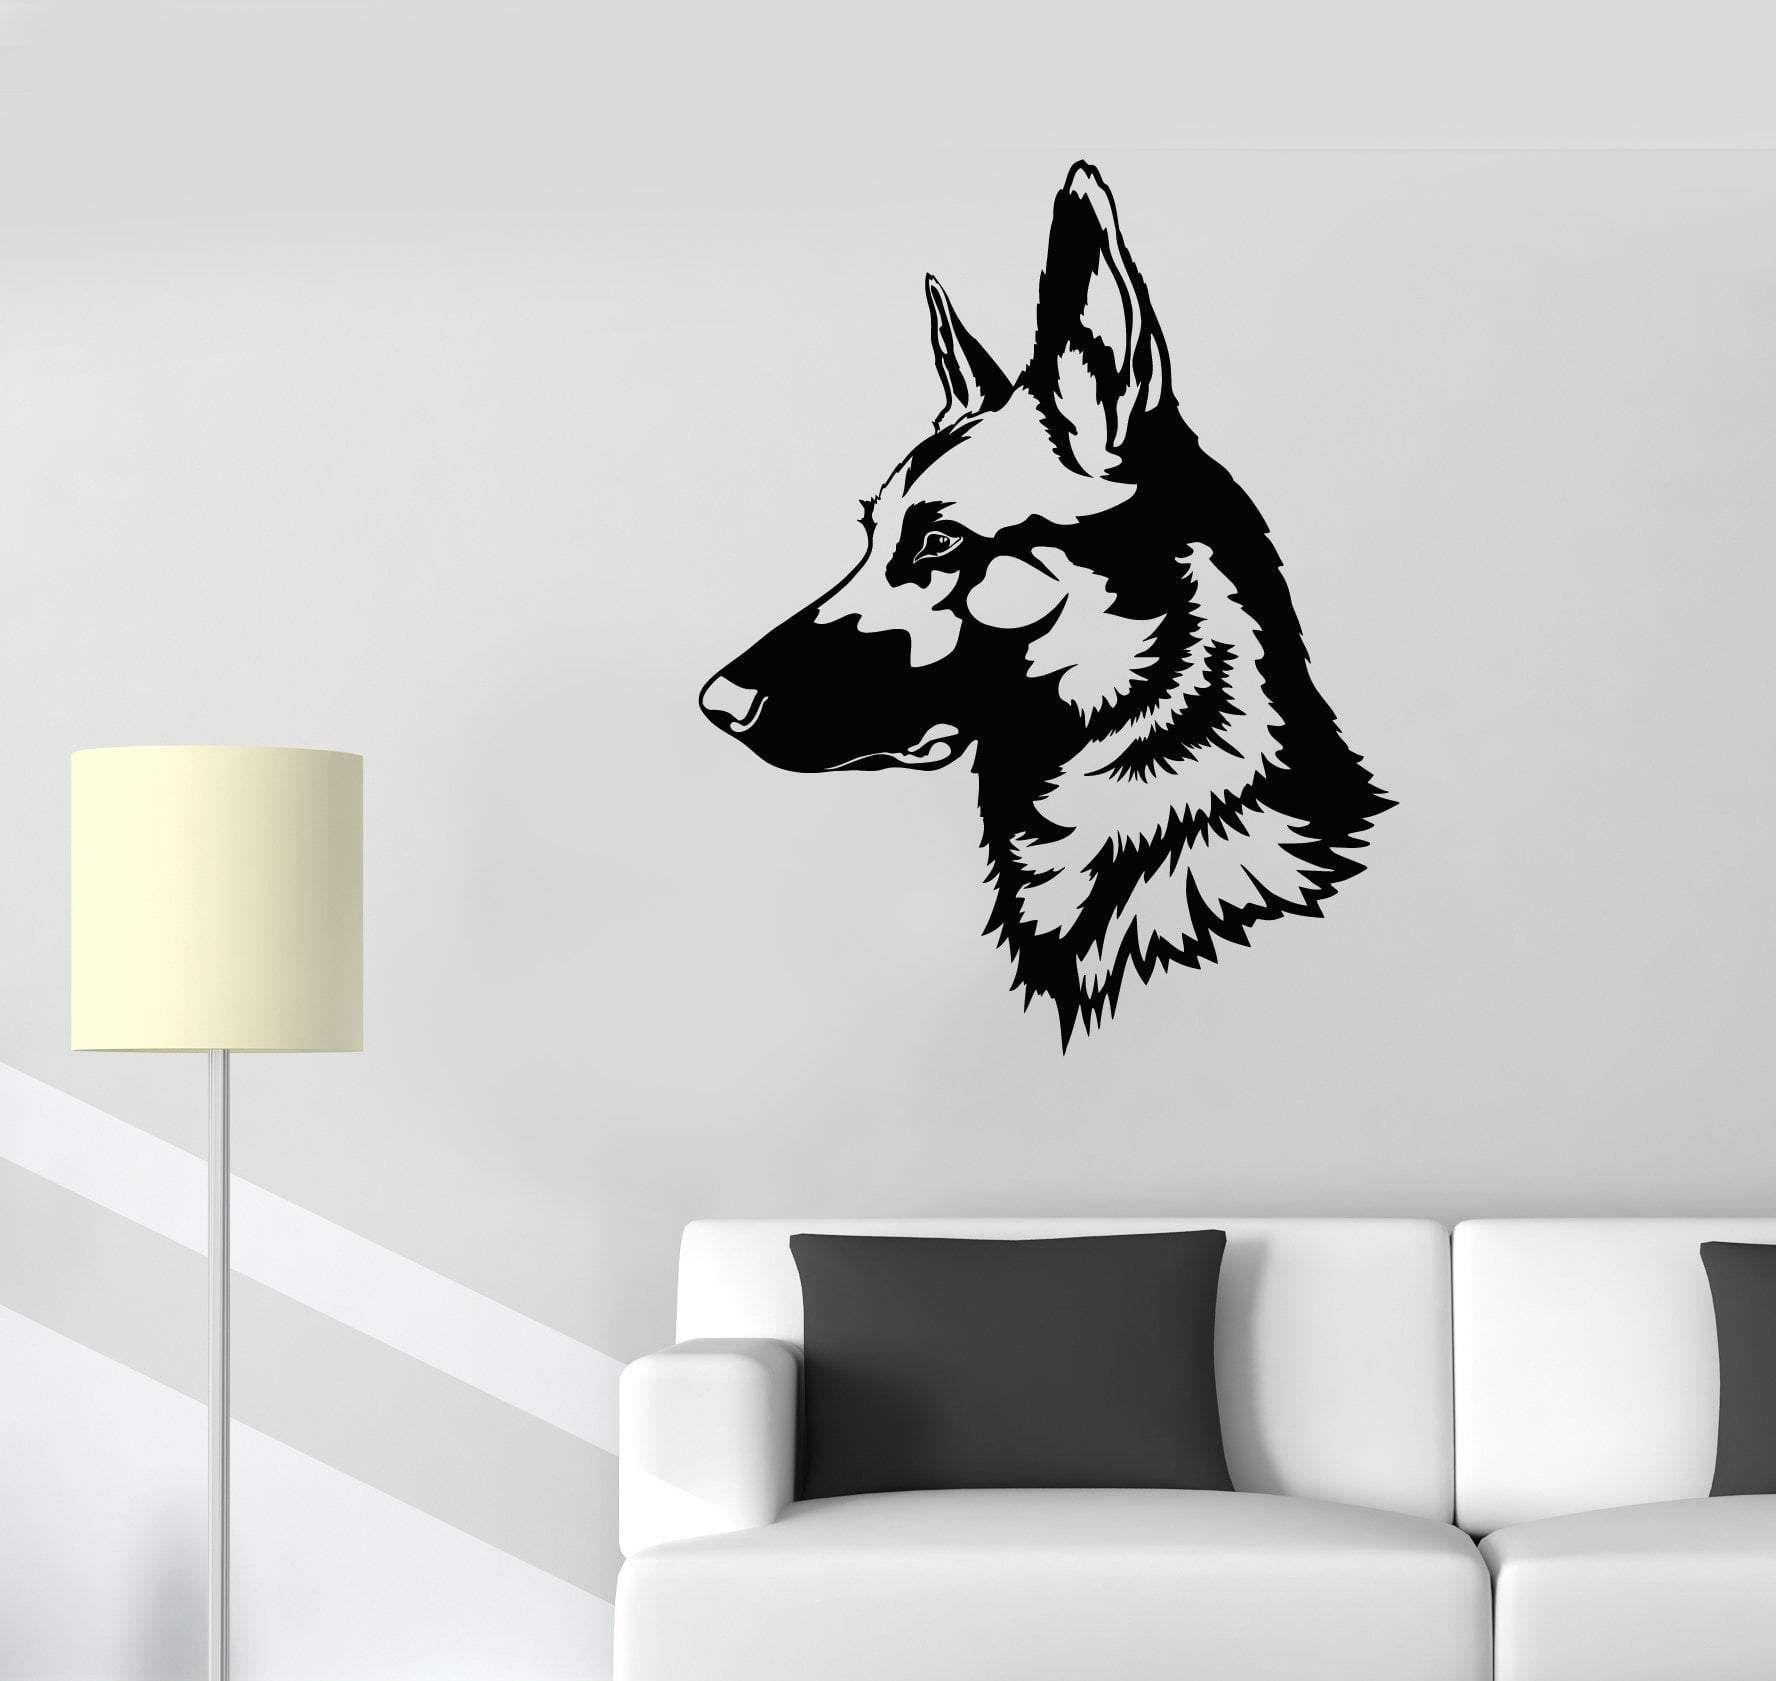 Vinyl Wall Decal German Shepherd Dog Pet House Animal Stickers 2449ig Vinyl Wall Decals Animal Stickers Vinyl Wall [ 1681 x 1776 Pixel ]